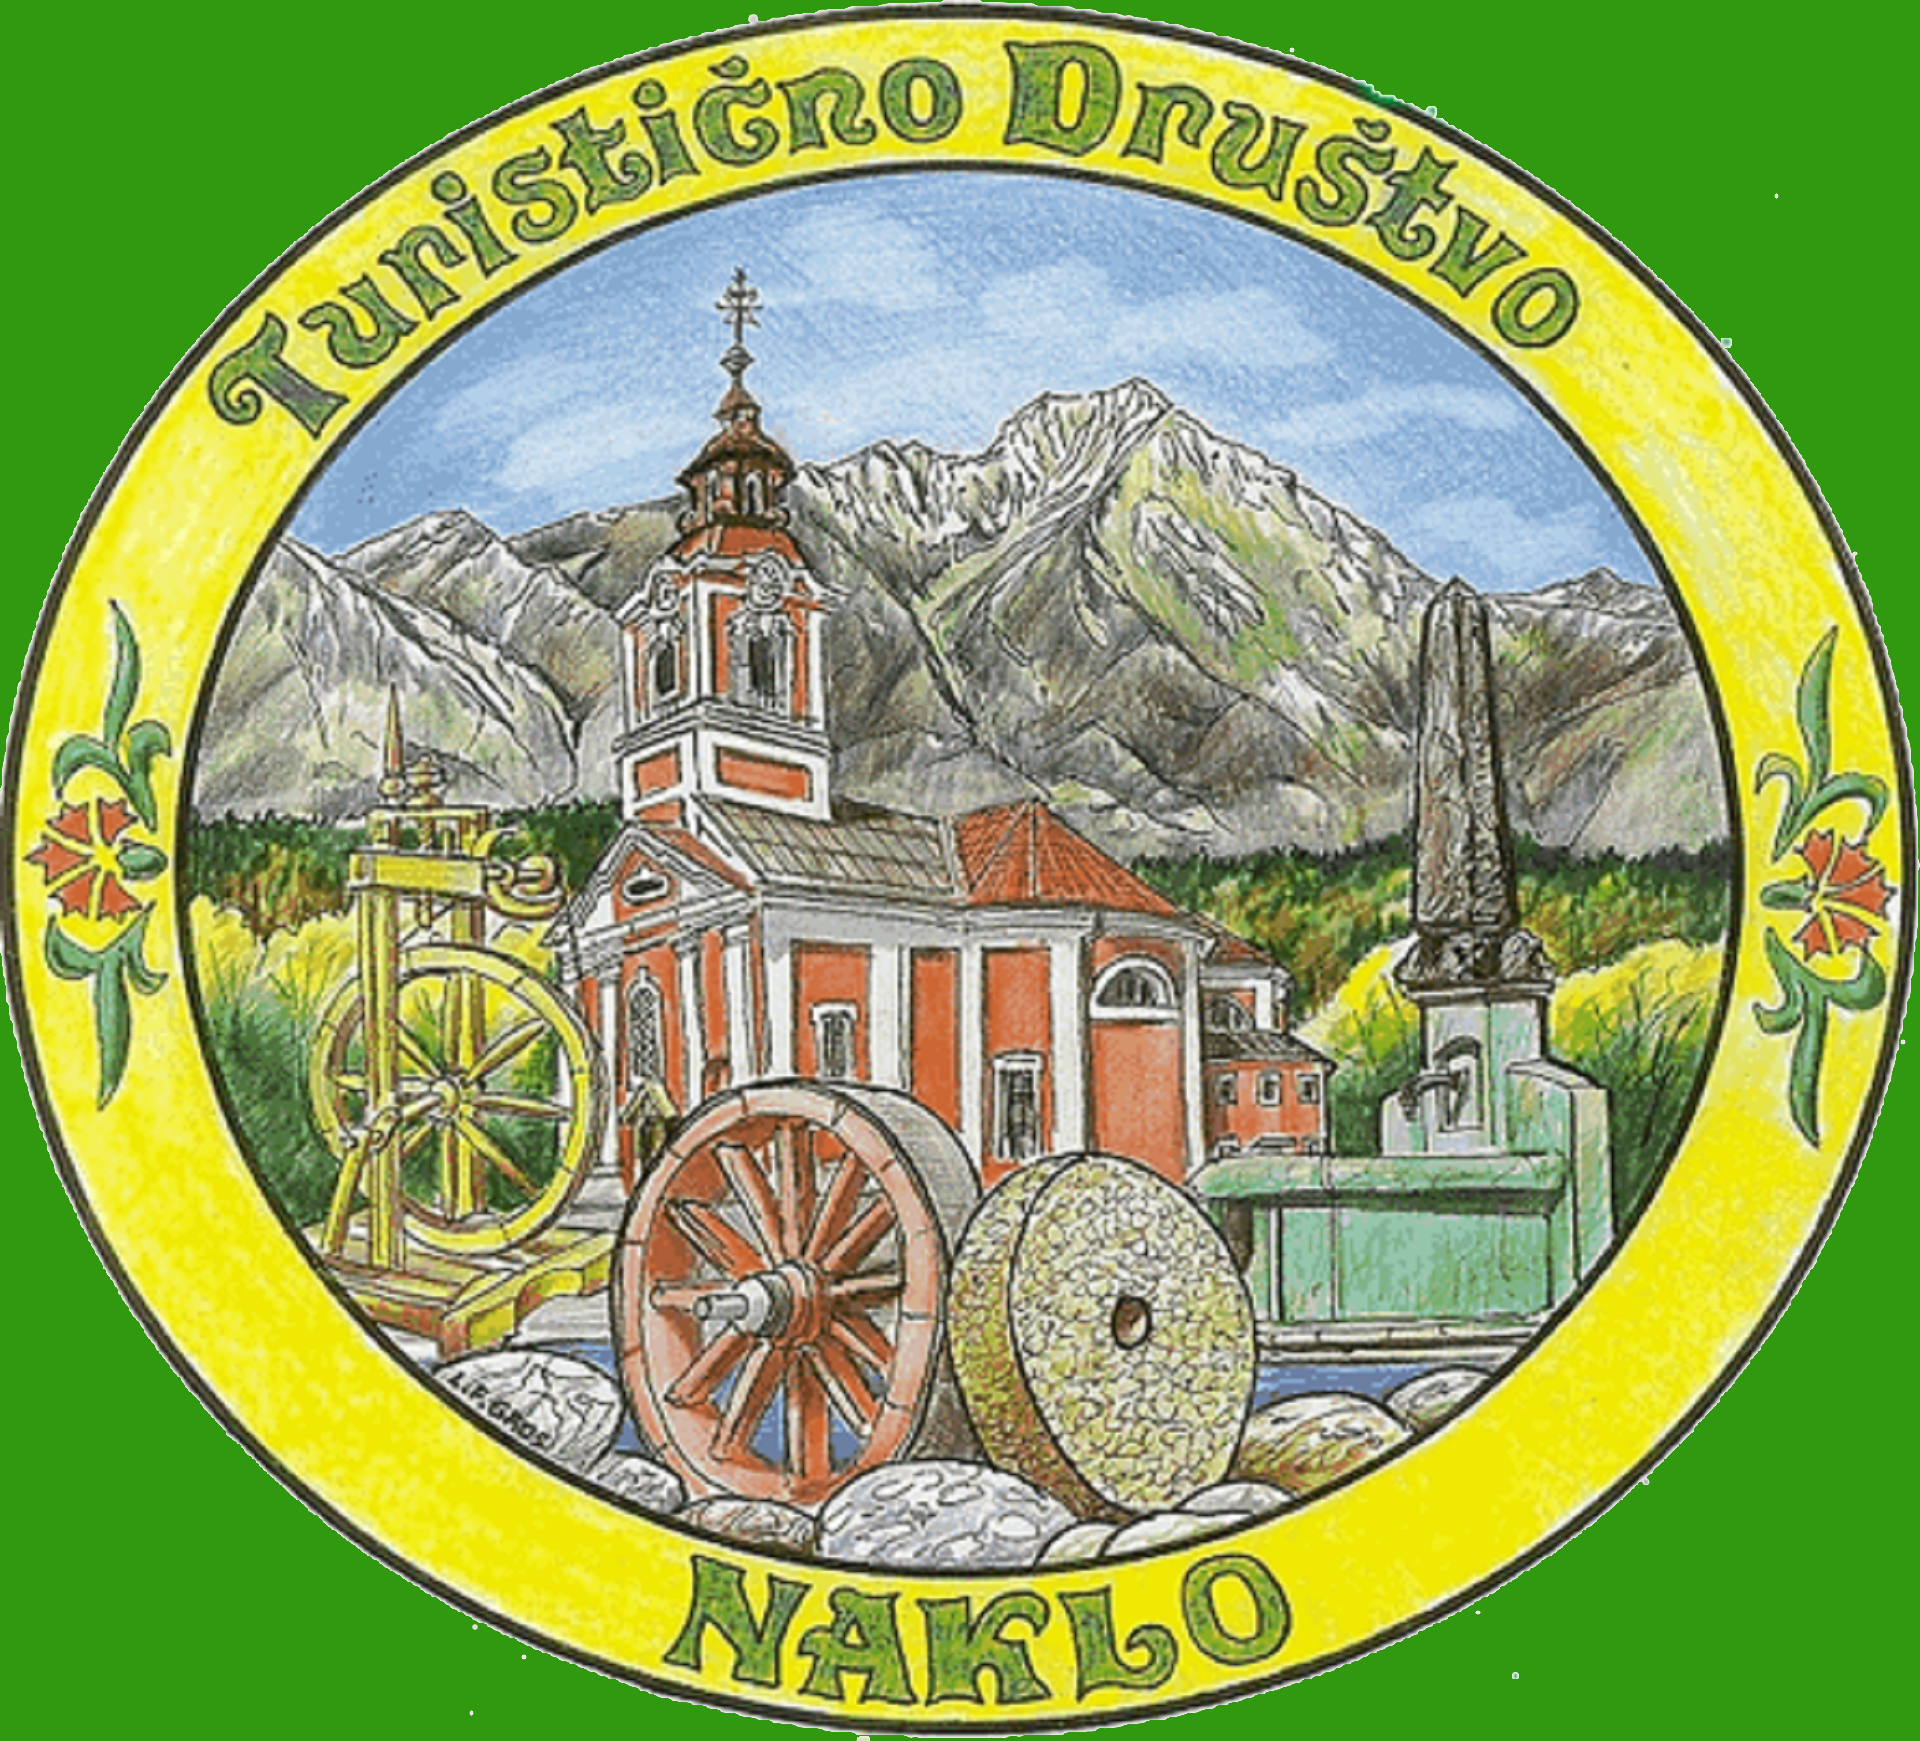 TOURIST SOCIETY NAKLO